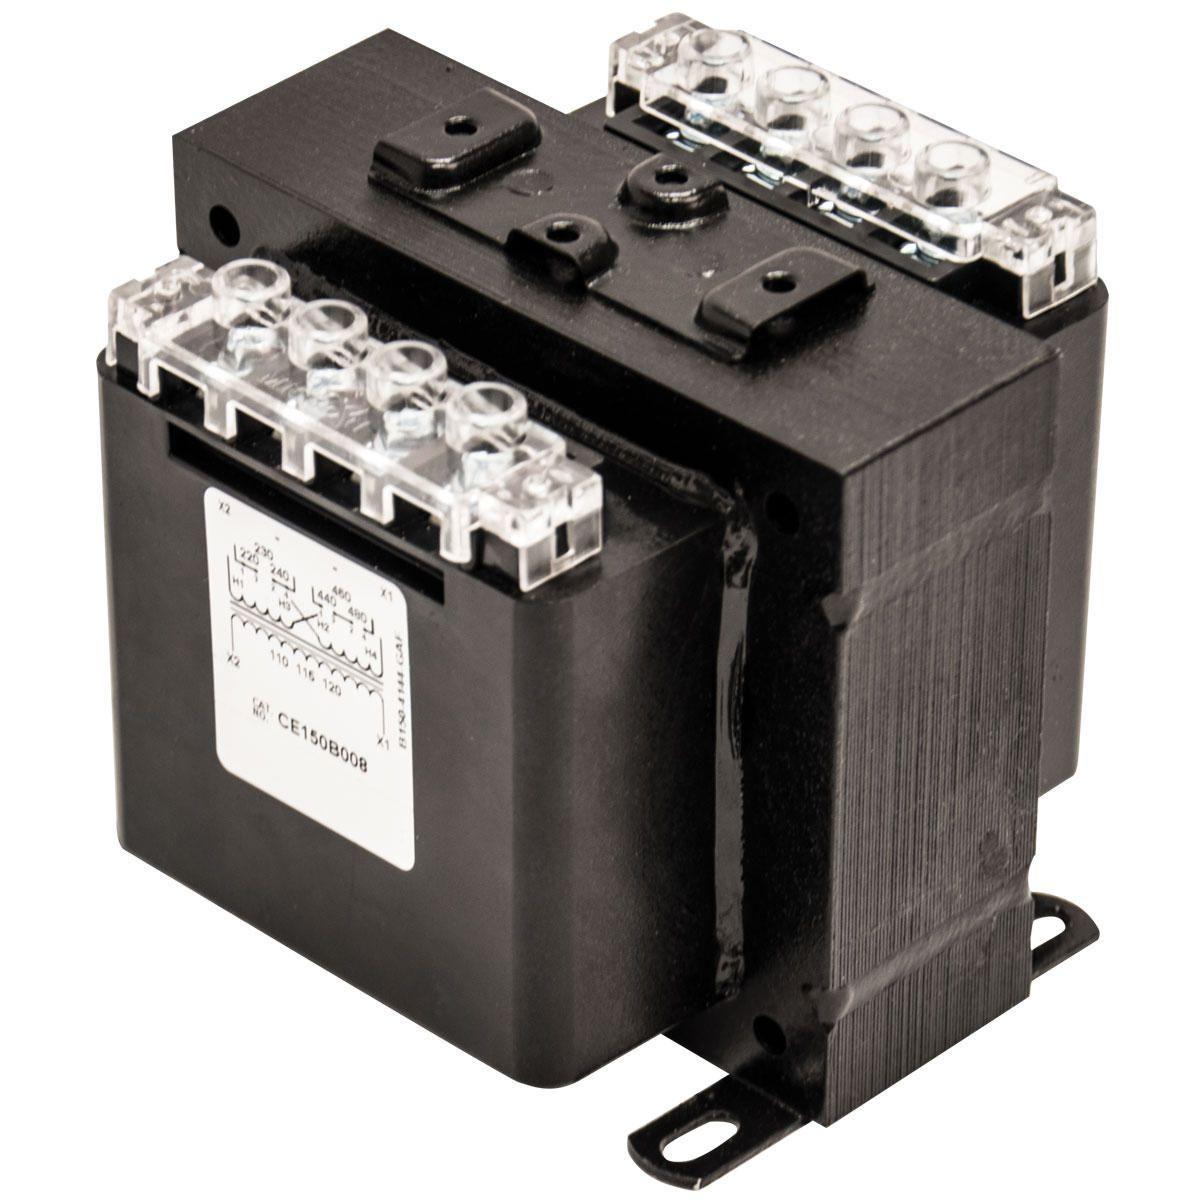 hight resolution of ce350b009 industrial control tranformer power quality single phase transformer wiring connections control transformer wiring diagram 230